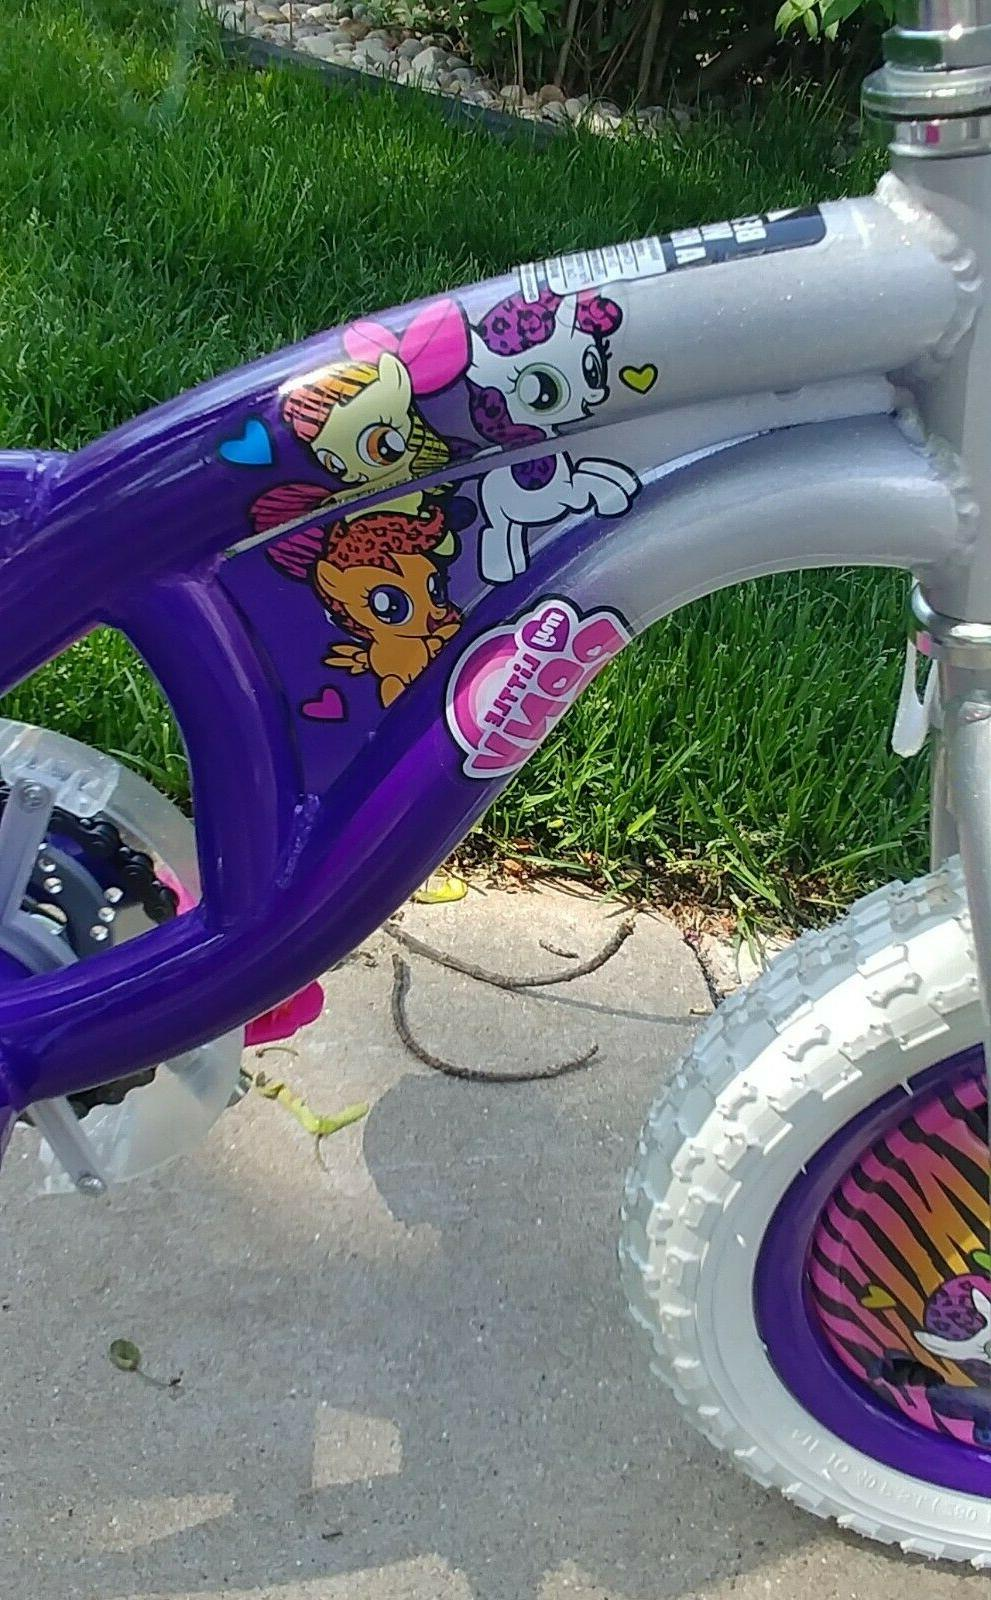 Dynacraft My Little Pony Girl's Bike LOCAL